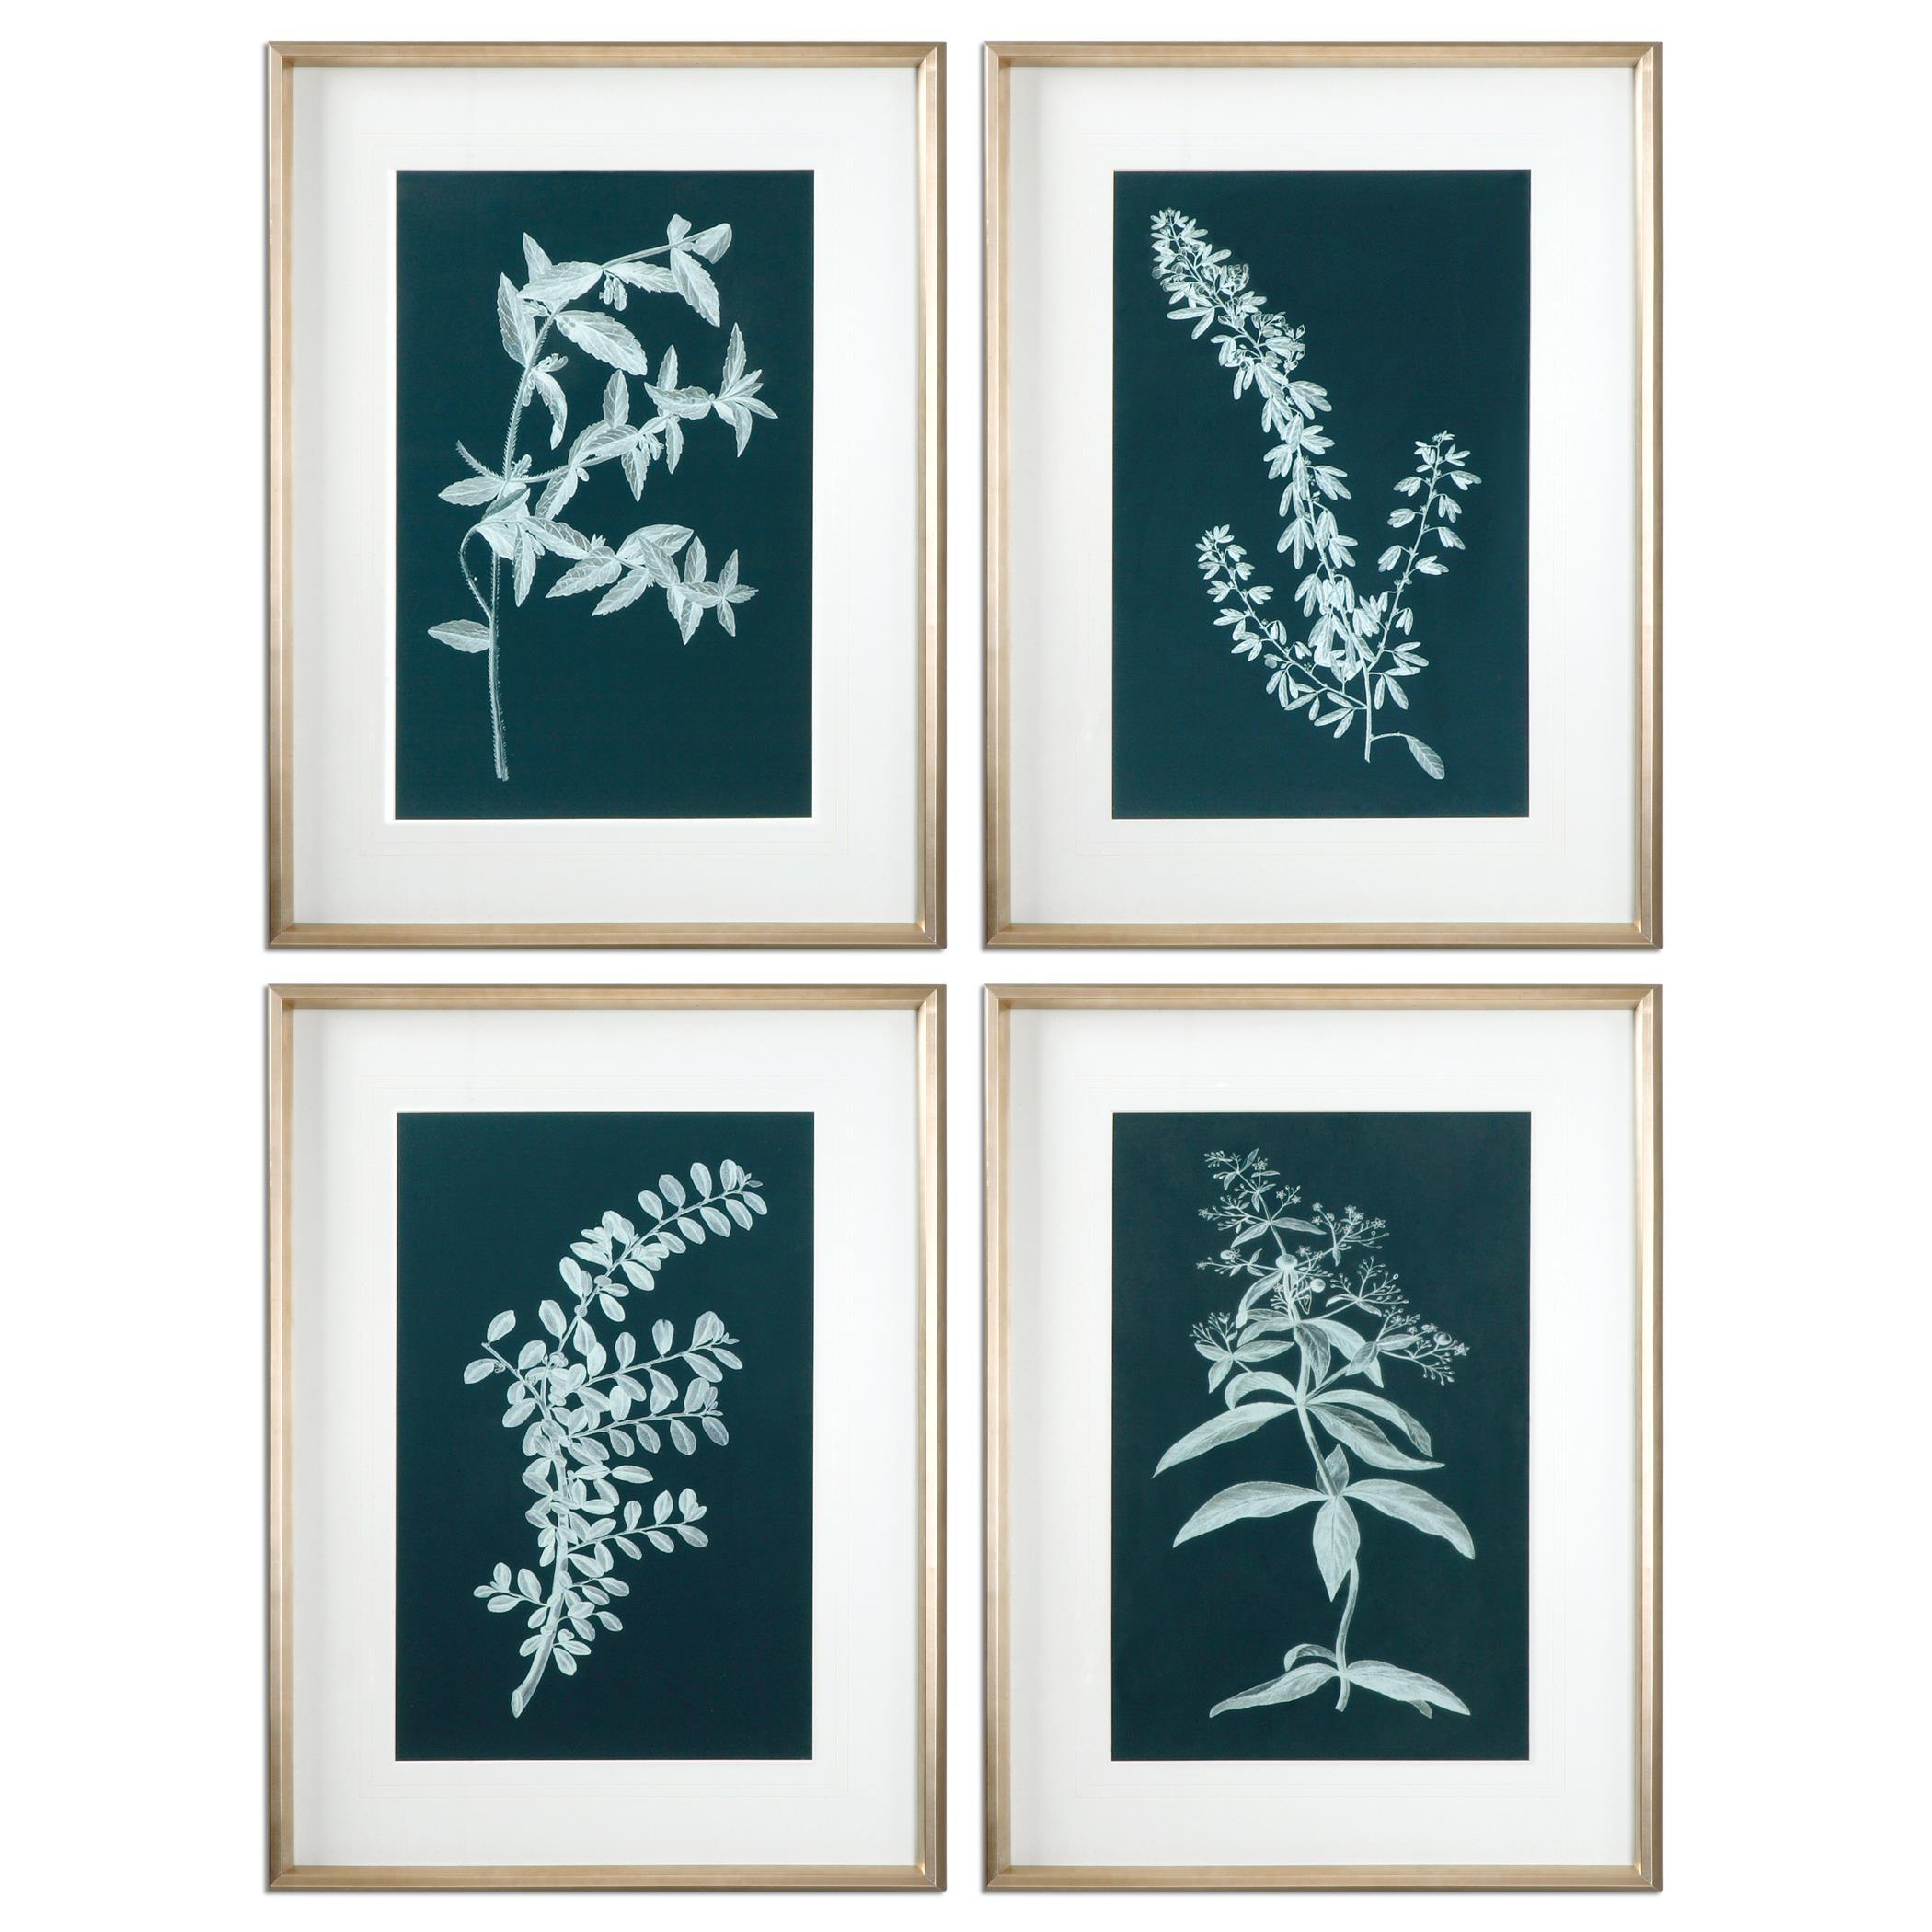 Uttermost Art Pale Stems Of Spring Floral Art, S/4 - Item Number: 33613